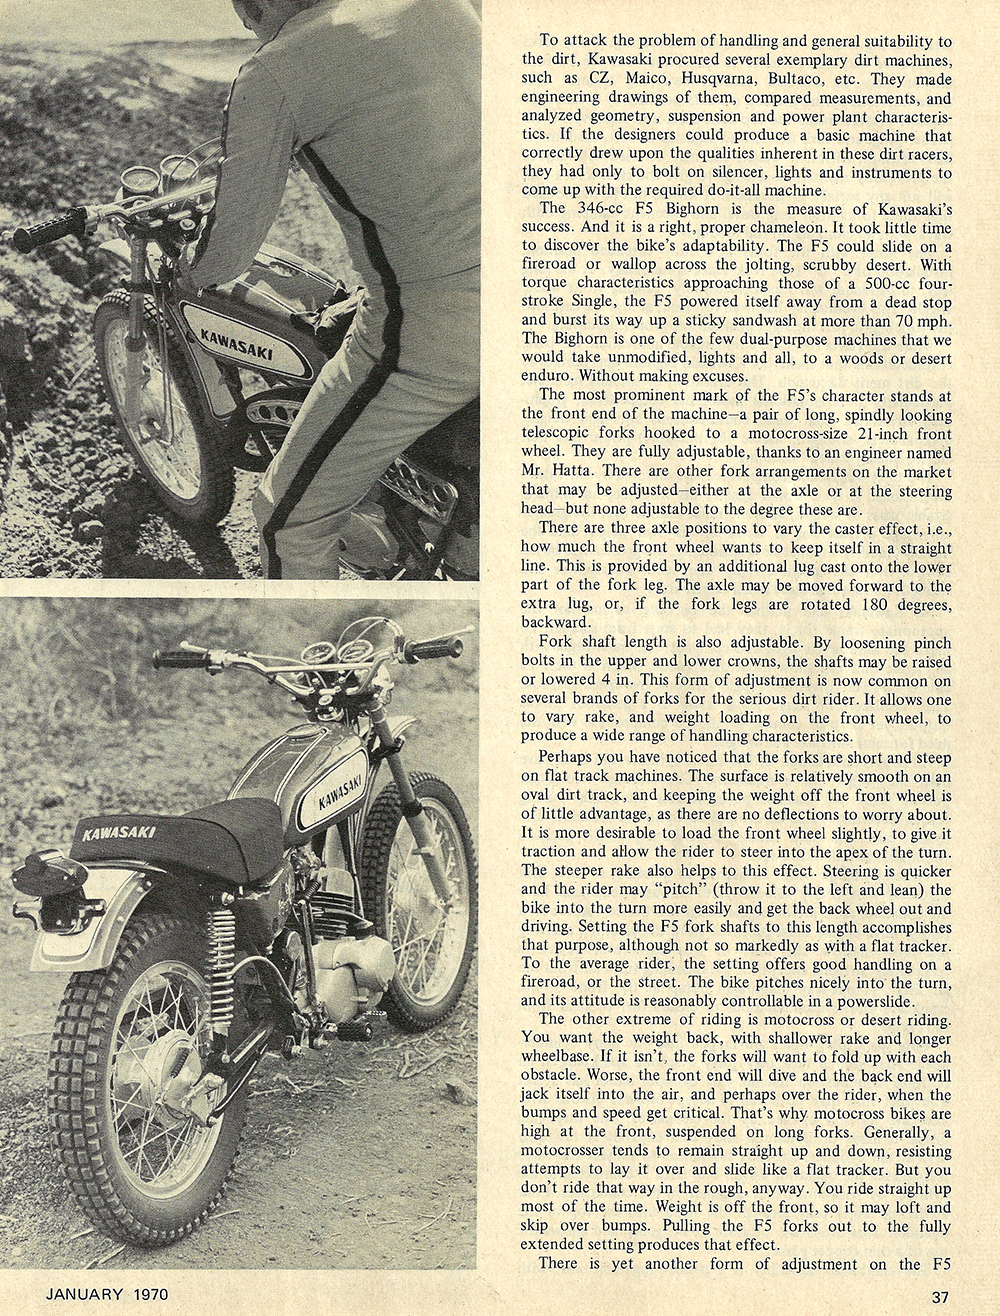 1970 Kawasaki F5 Bighorn road test 02.jpg